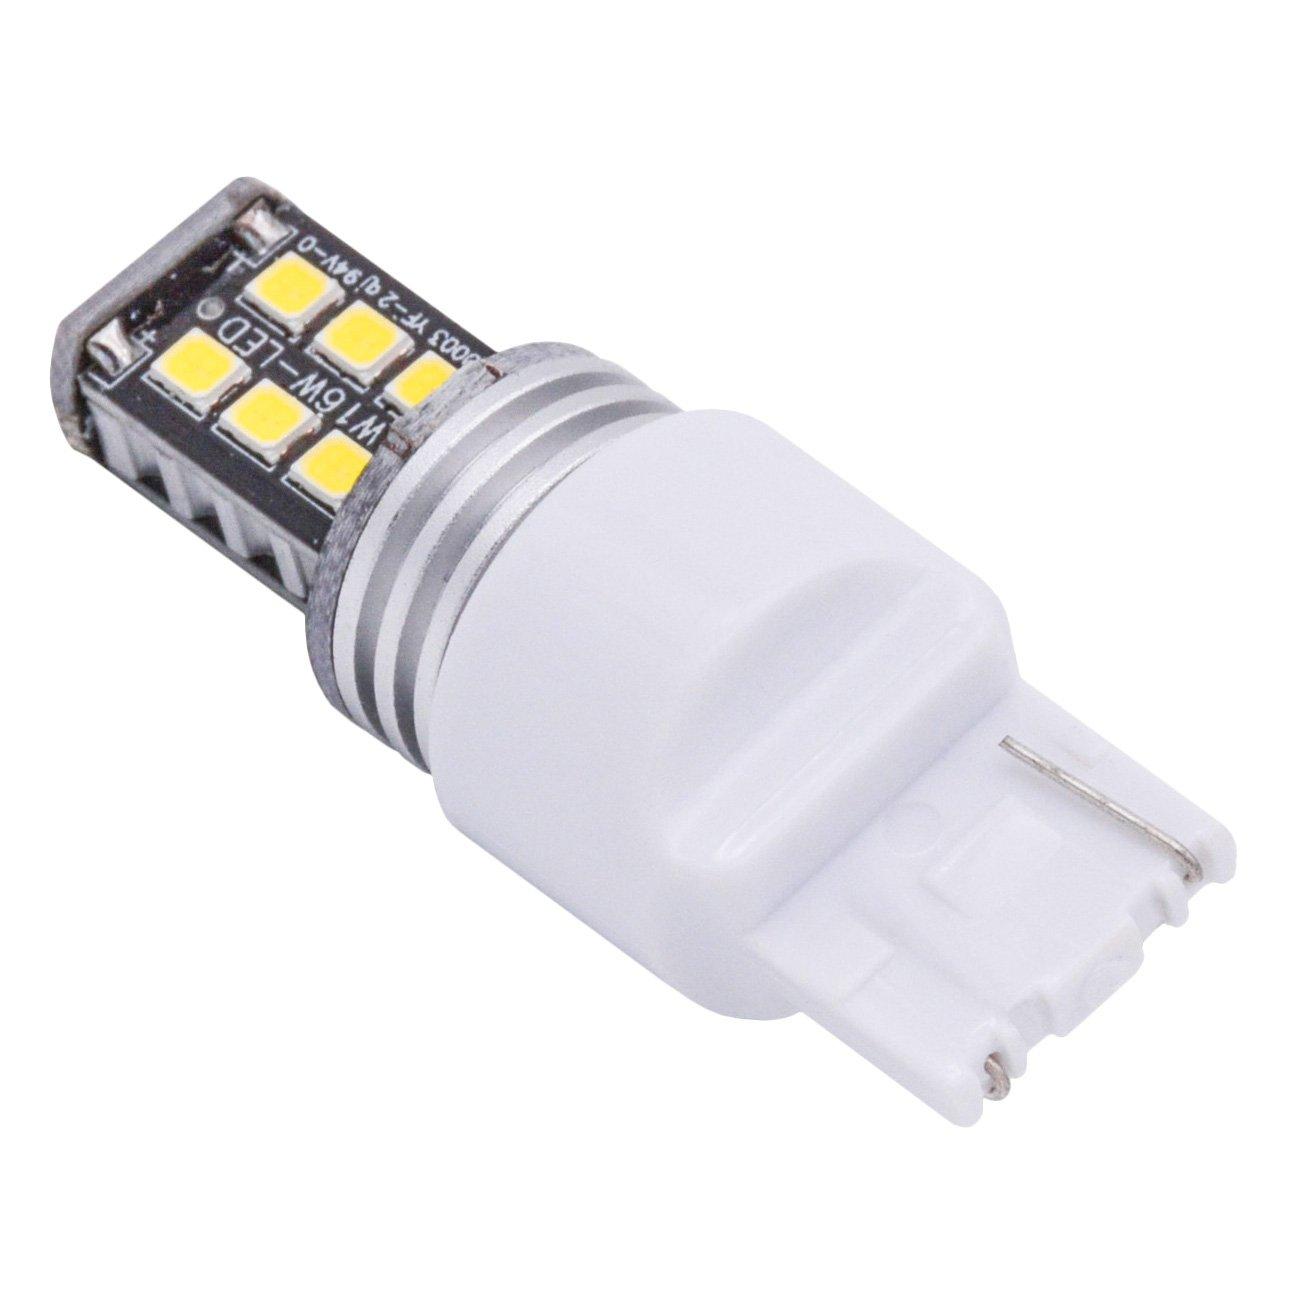 KaTur 2pcs High Power 800 Lumens Super Bright 7440 7440NA 7441 992 LED 15SMD 2835 Backup Reverse Tail Brake Lights Parking LED Blubs DC 12V Red